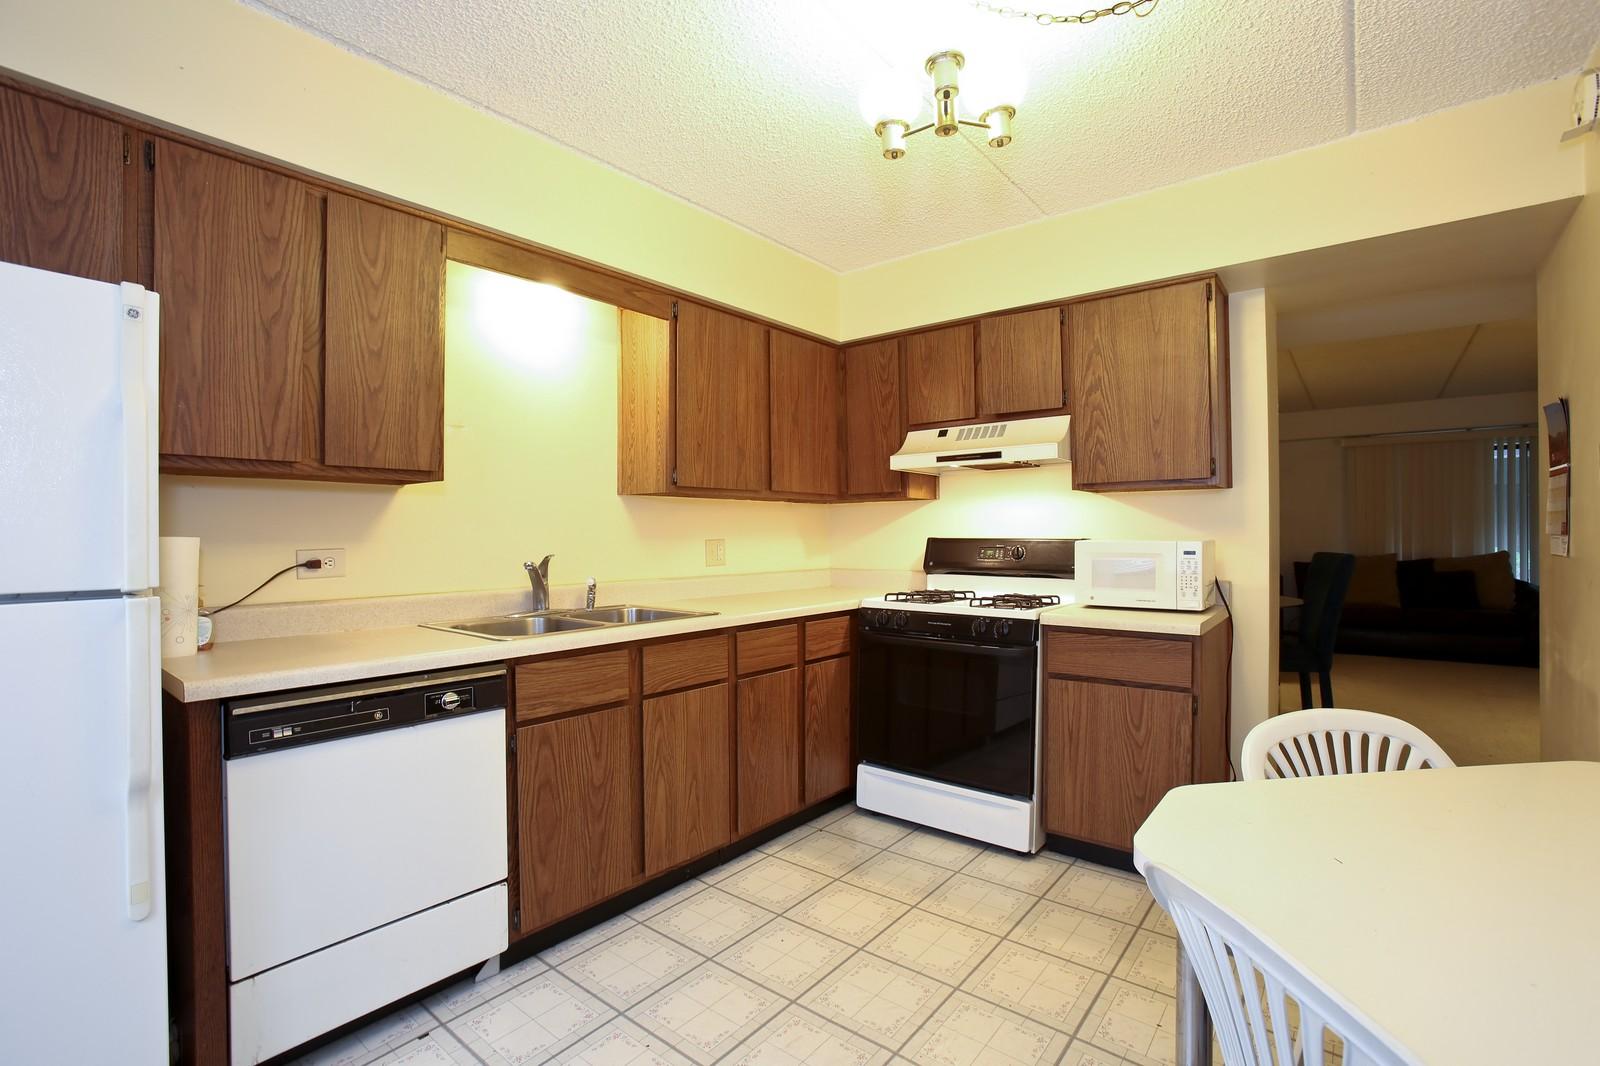 Real Estate Photography - 4946 Douglas Rd, Unit 102, Downers Grove, IL, 60515 - Kitchen